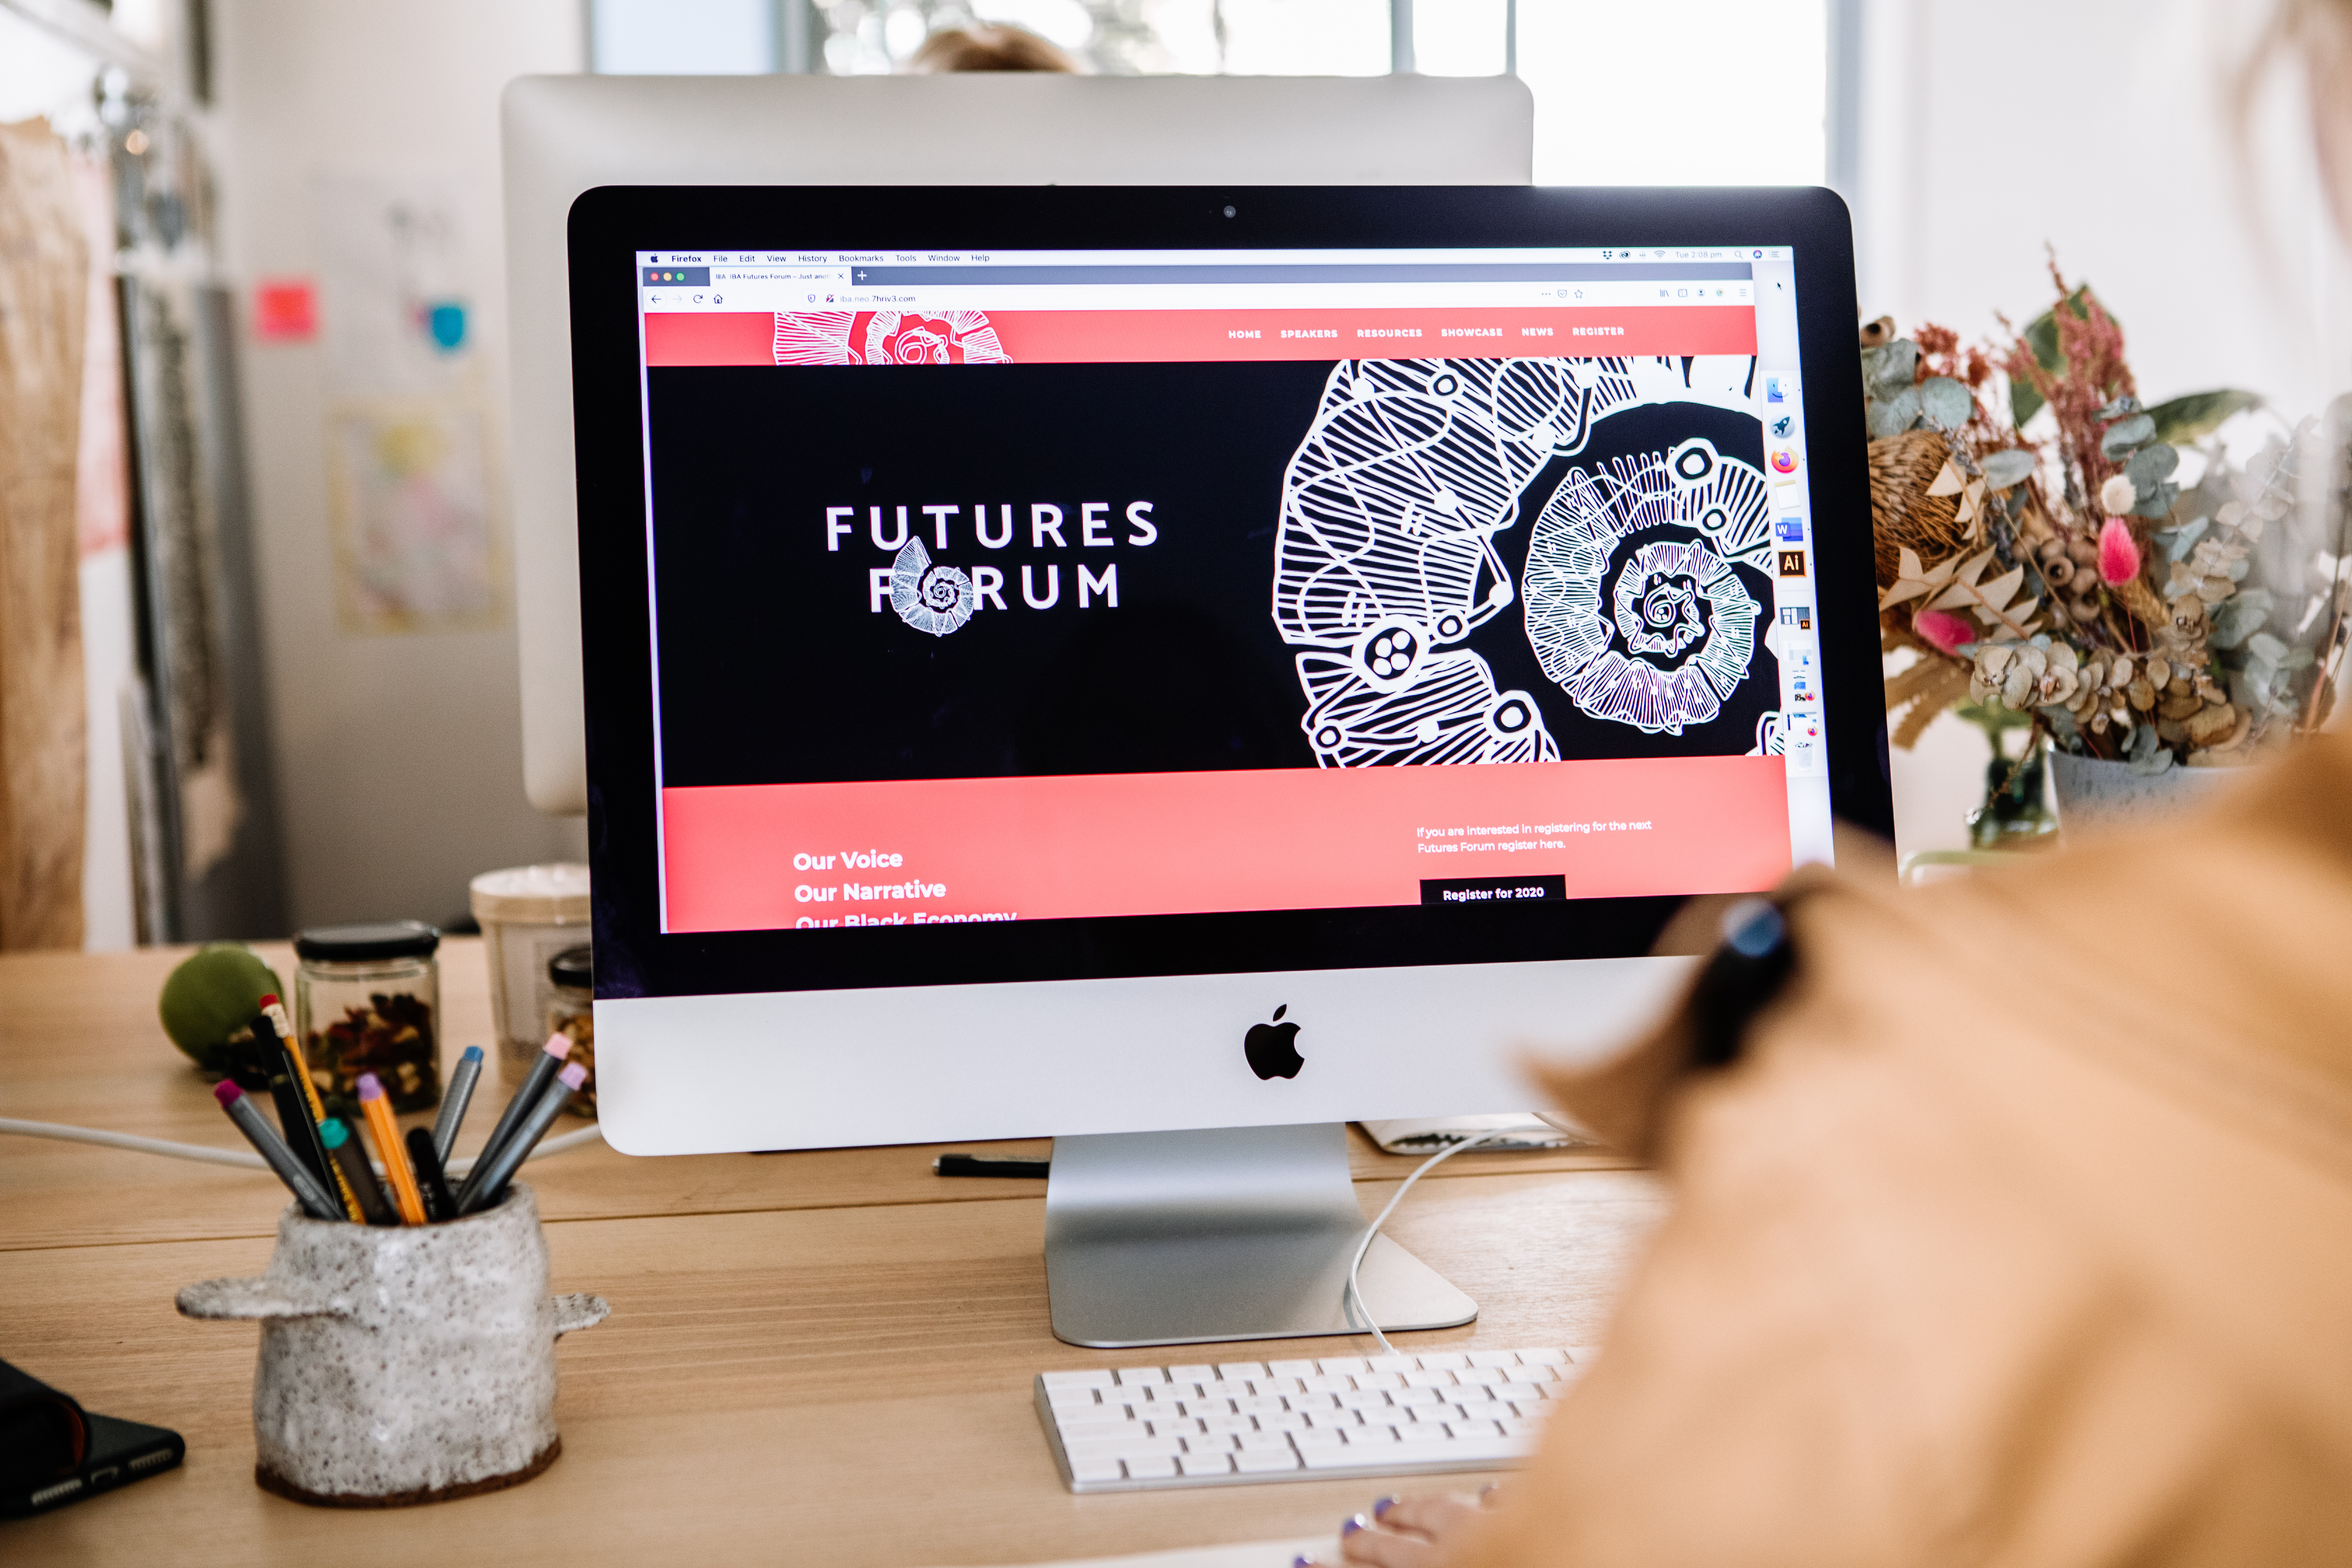 IBA Futures Forum website